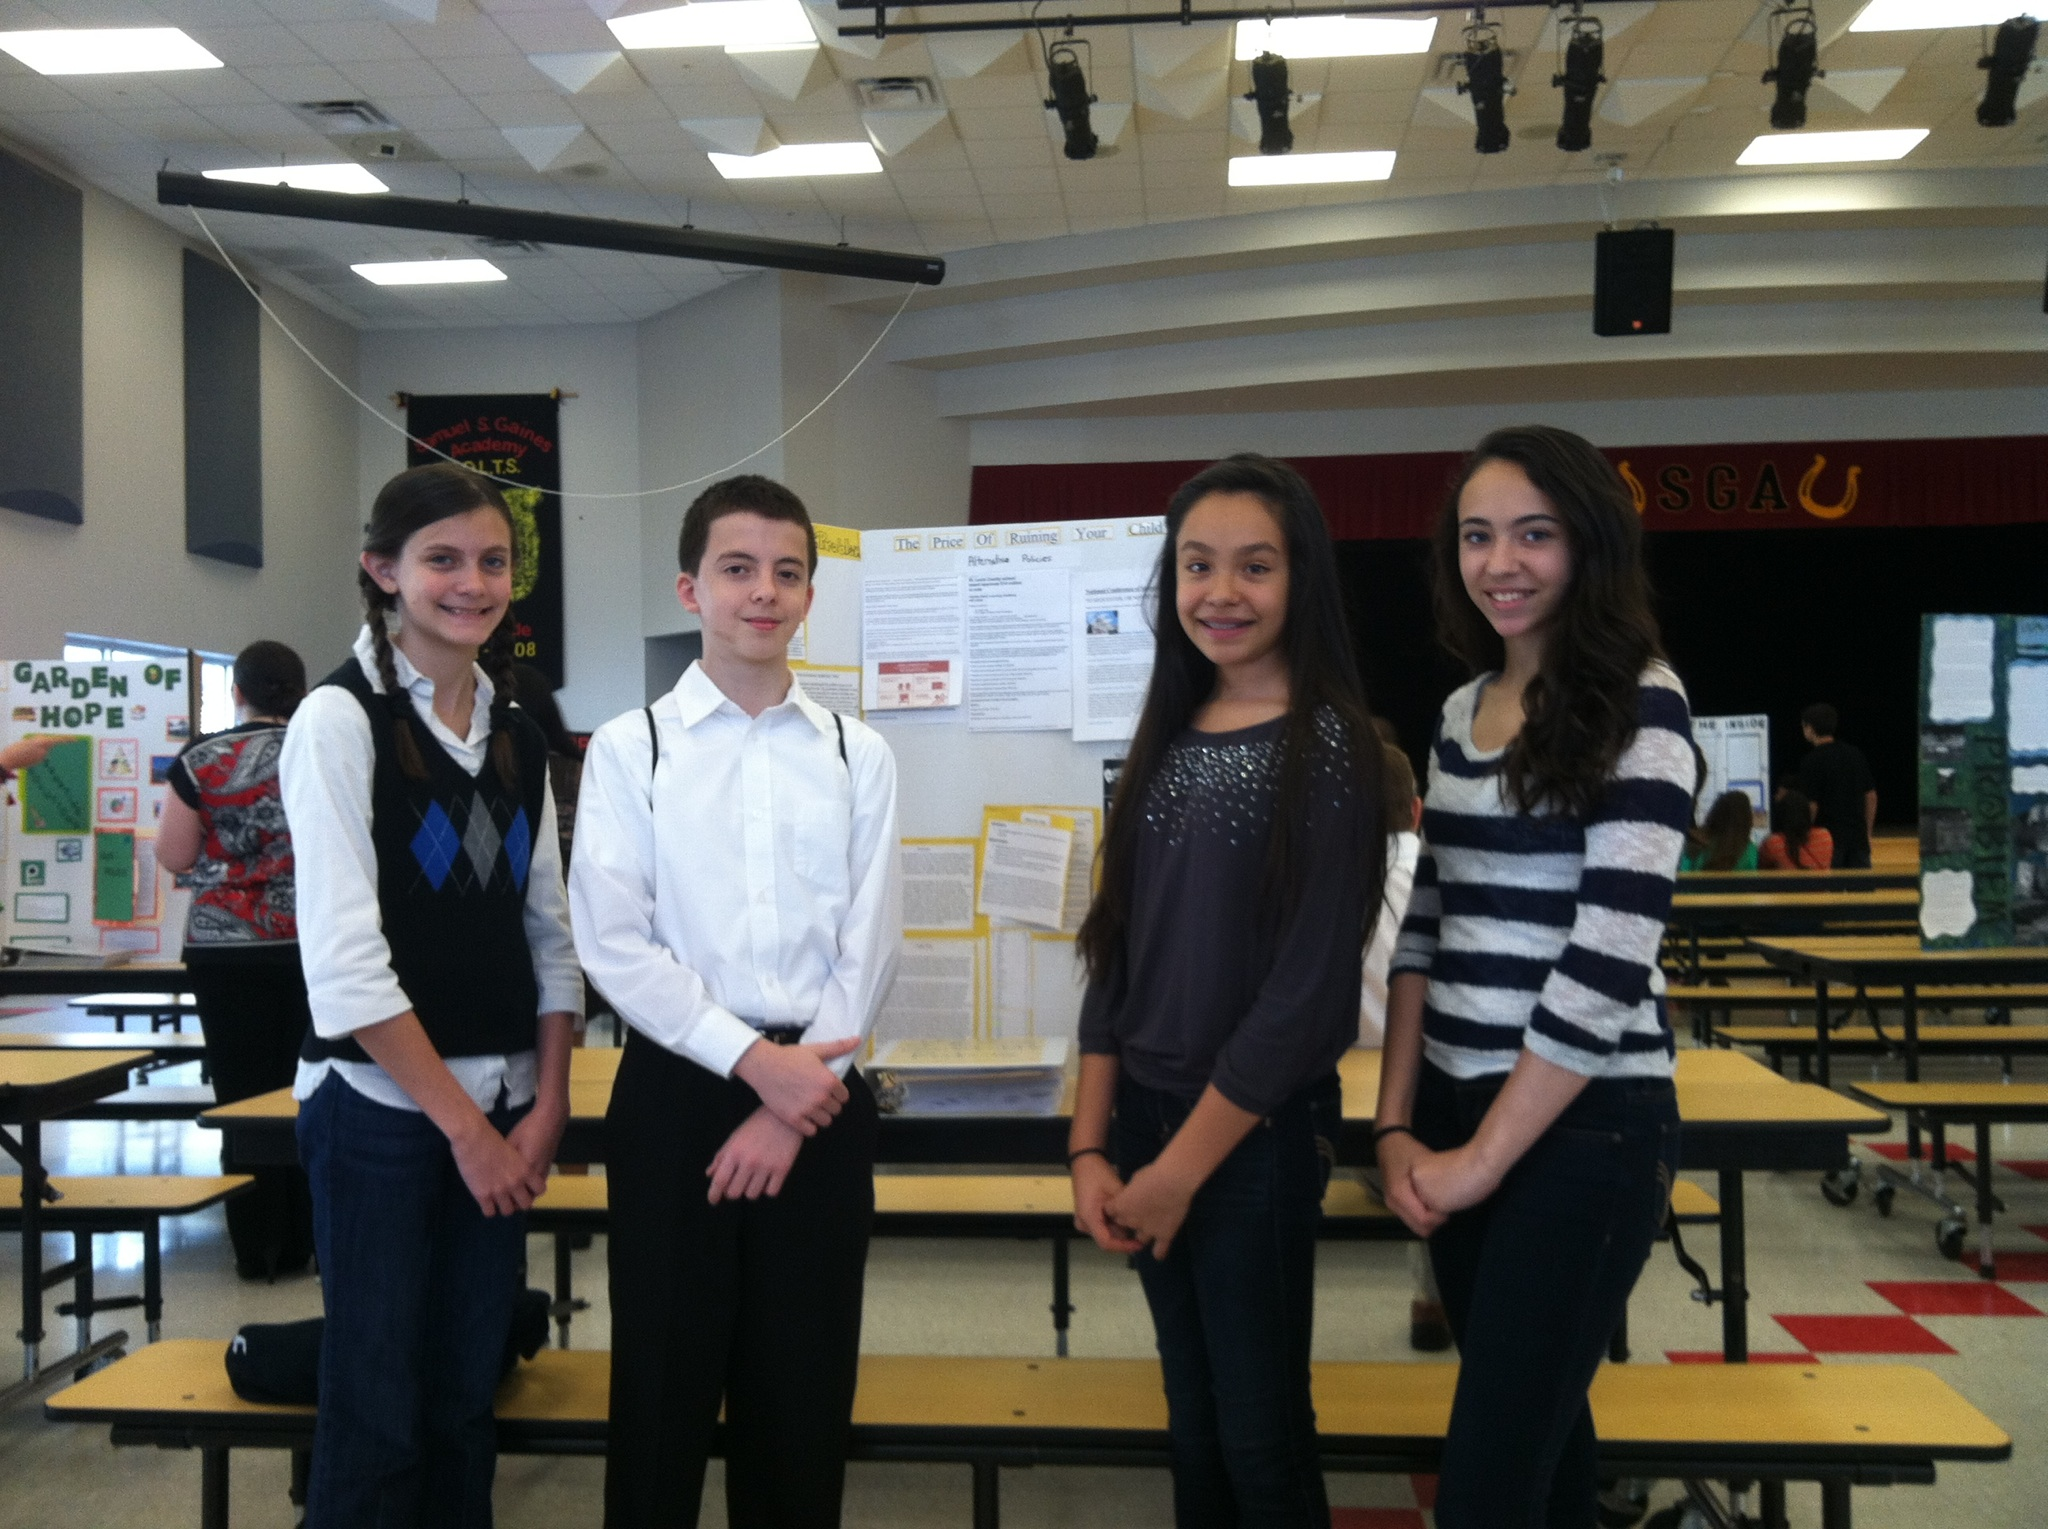 Northport celebrates Project Citizen success